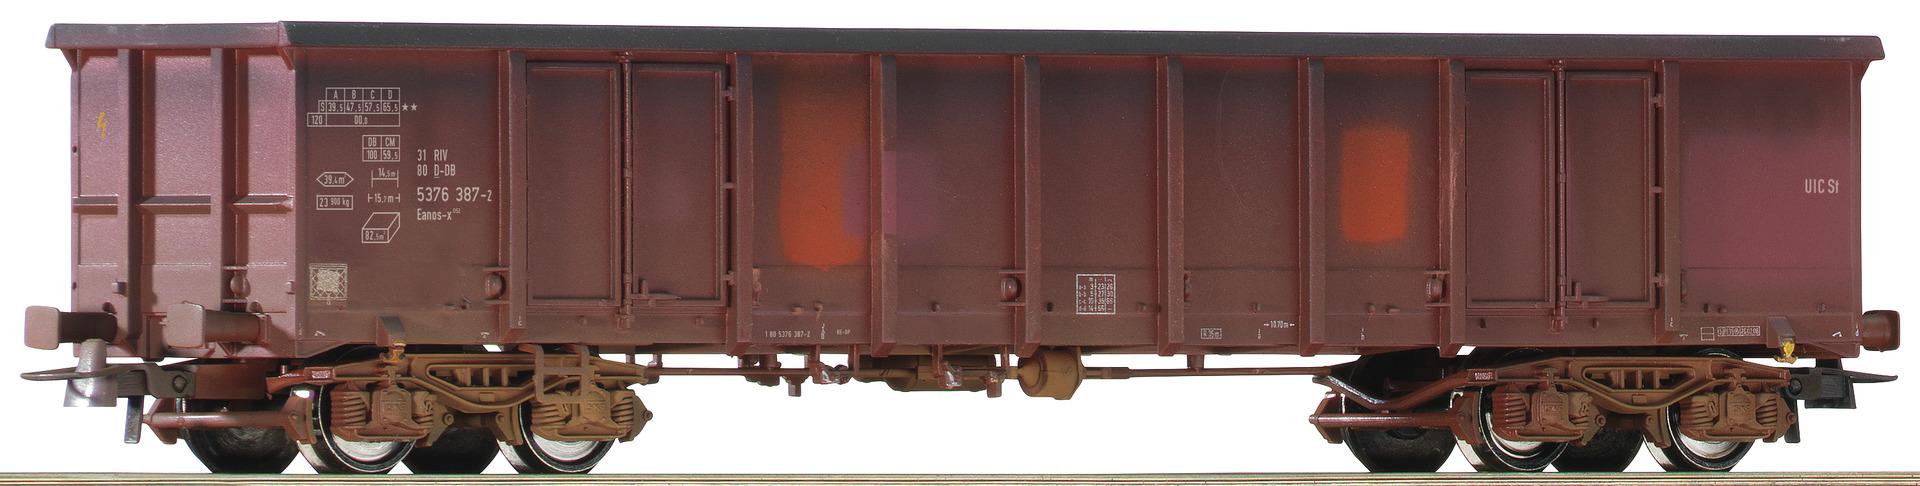 H0 Offener Güterwagen der DBAG, Ep.V/VI - gealtert